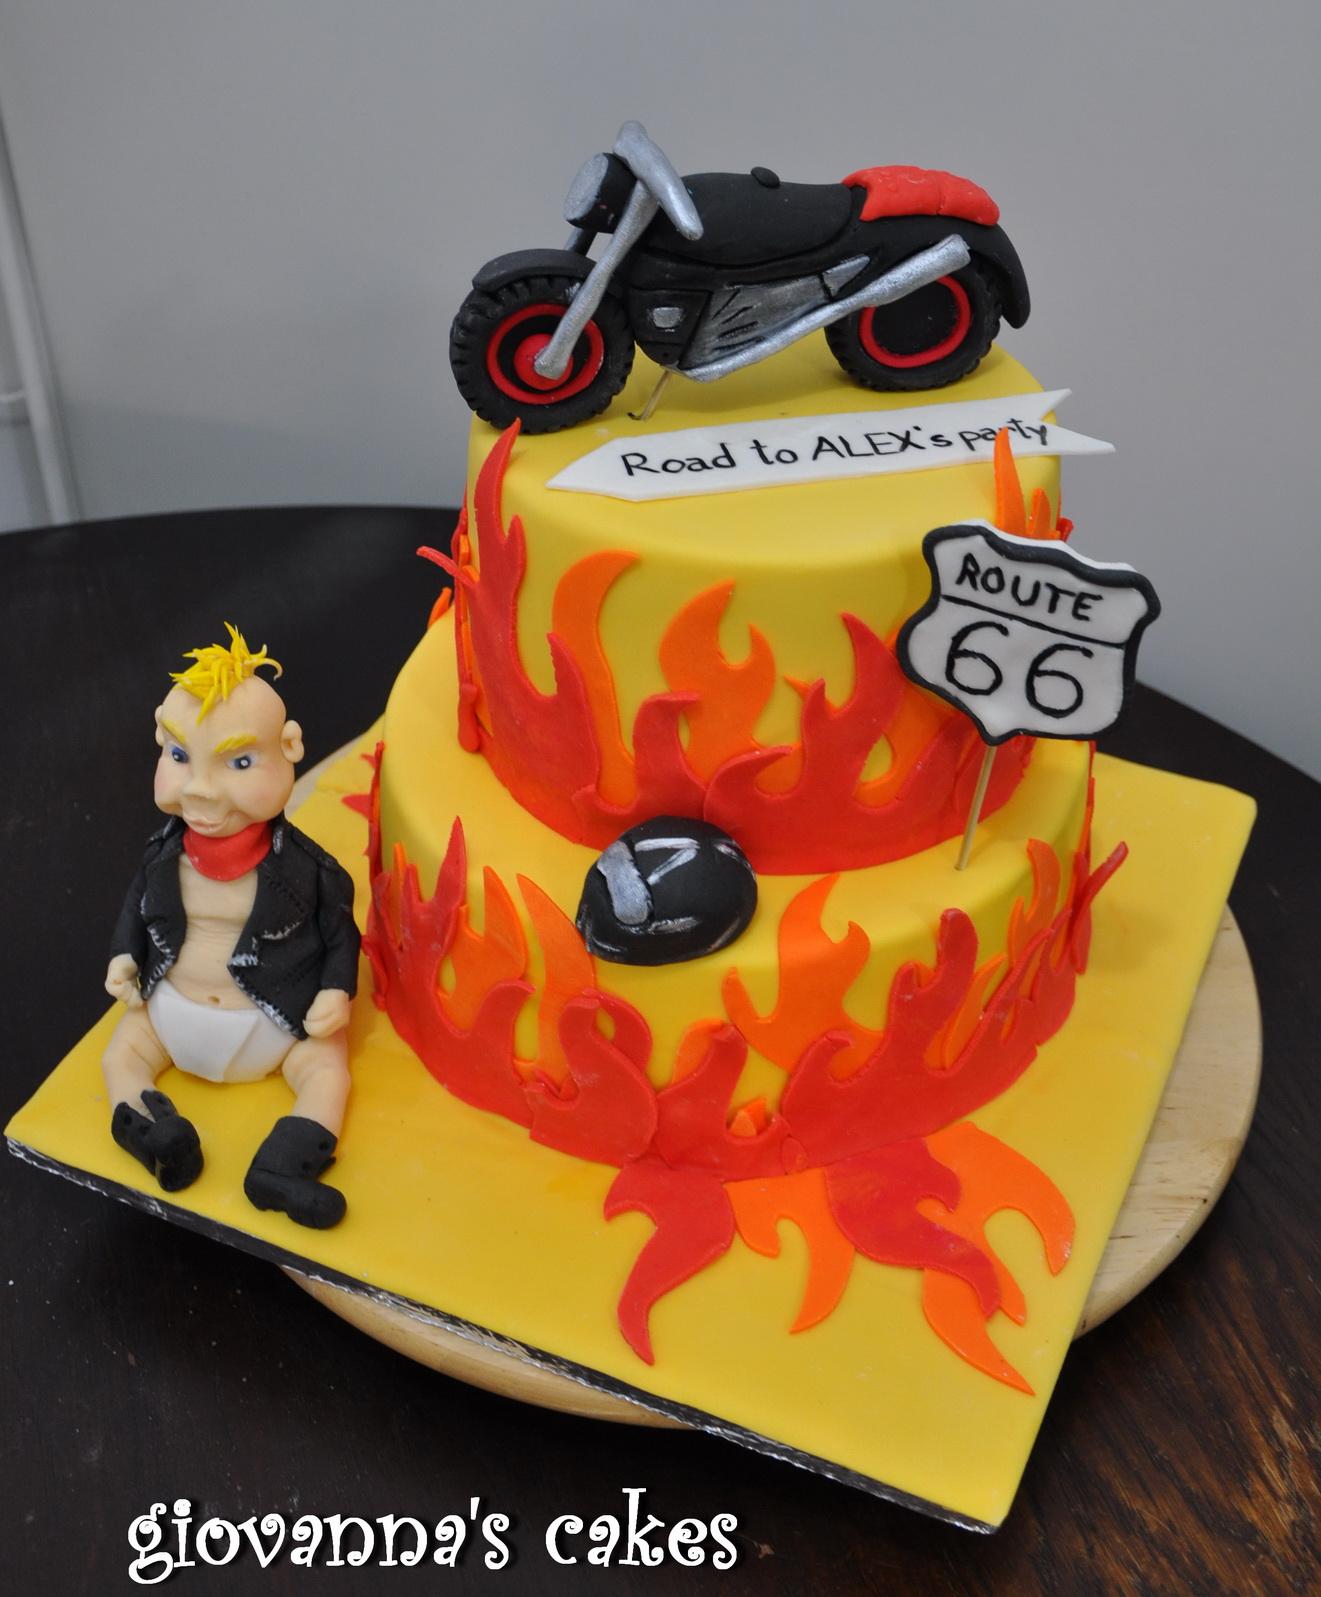 giovannas cakes Biker baby cake